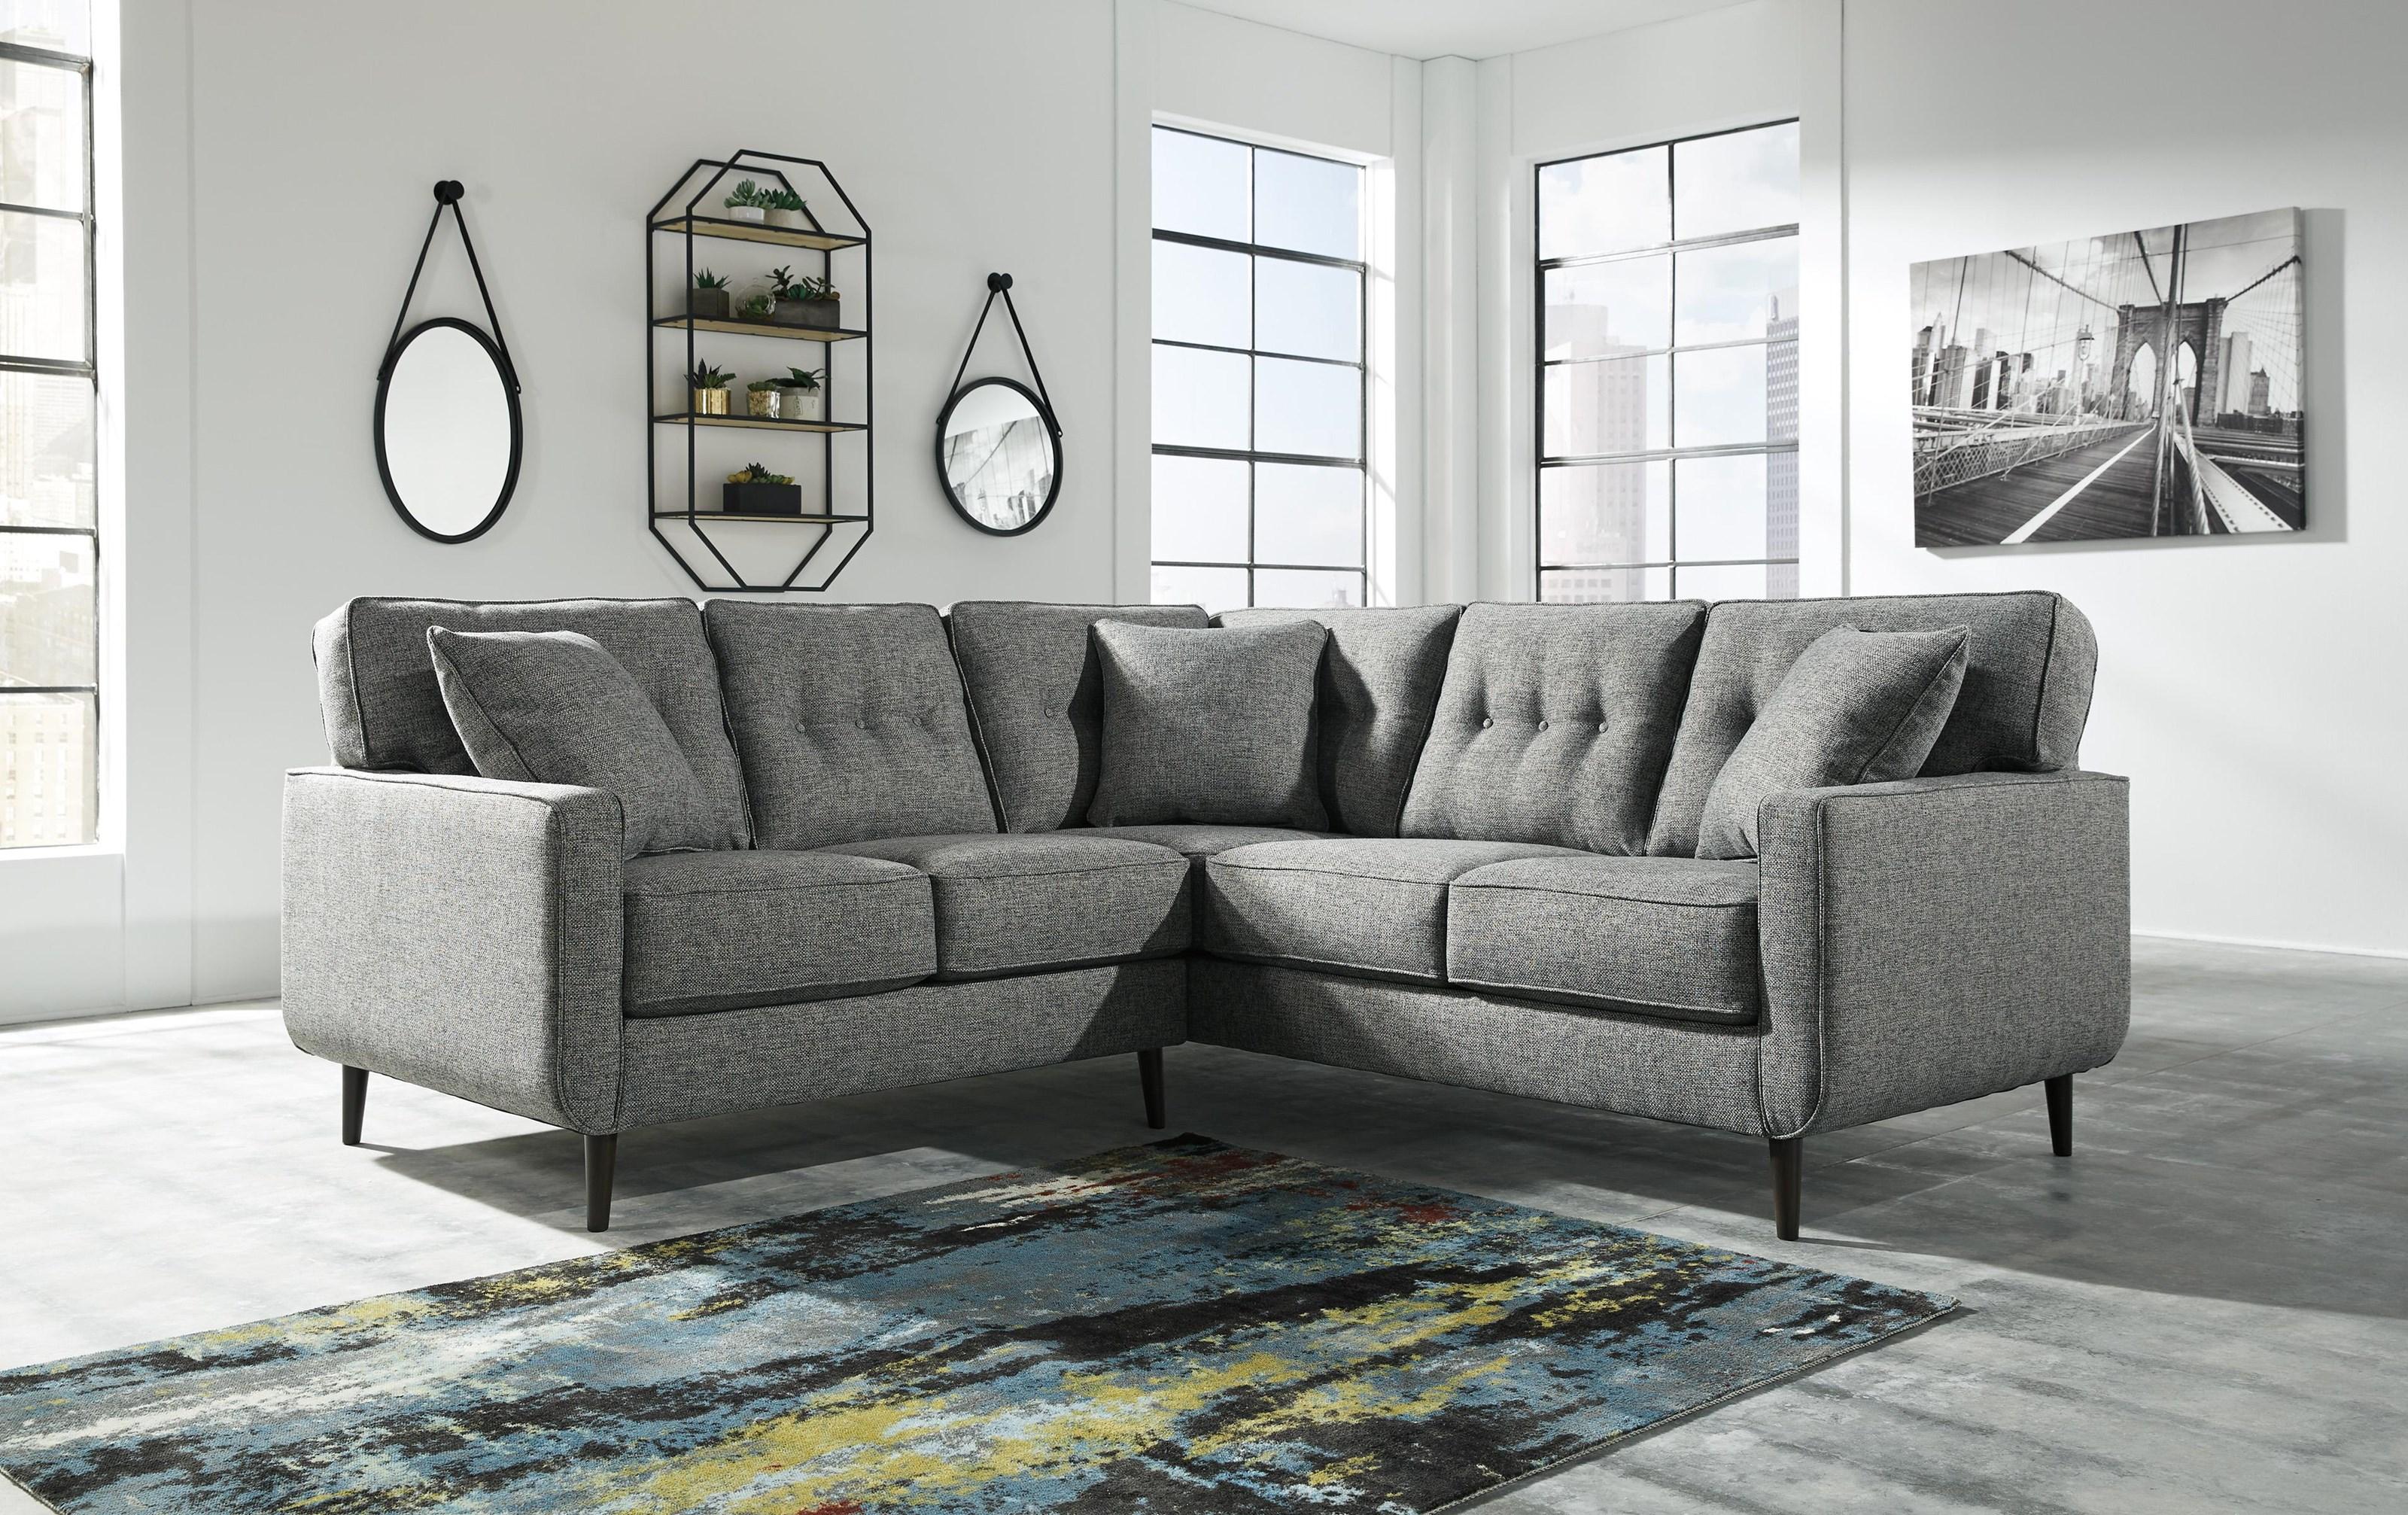 Ashley Furniture Zardoni 11402 49 55 Right Arm Facing 2 Piece